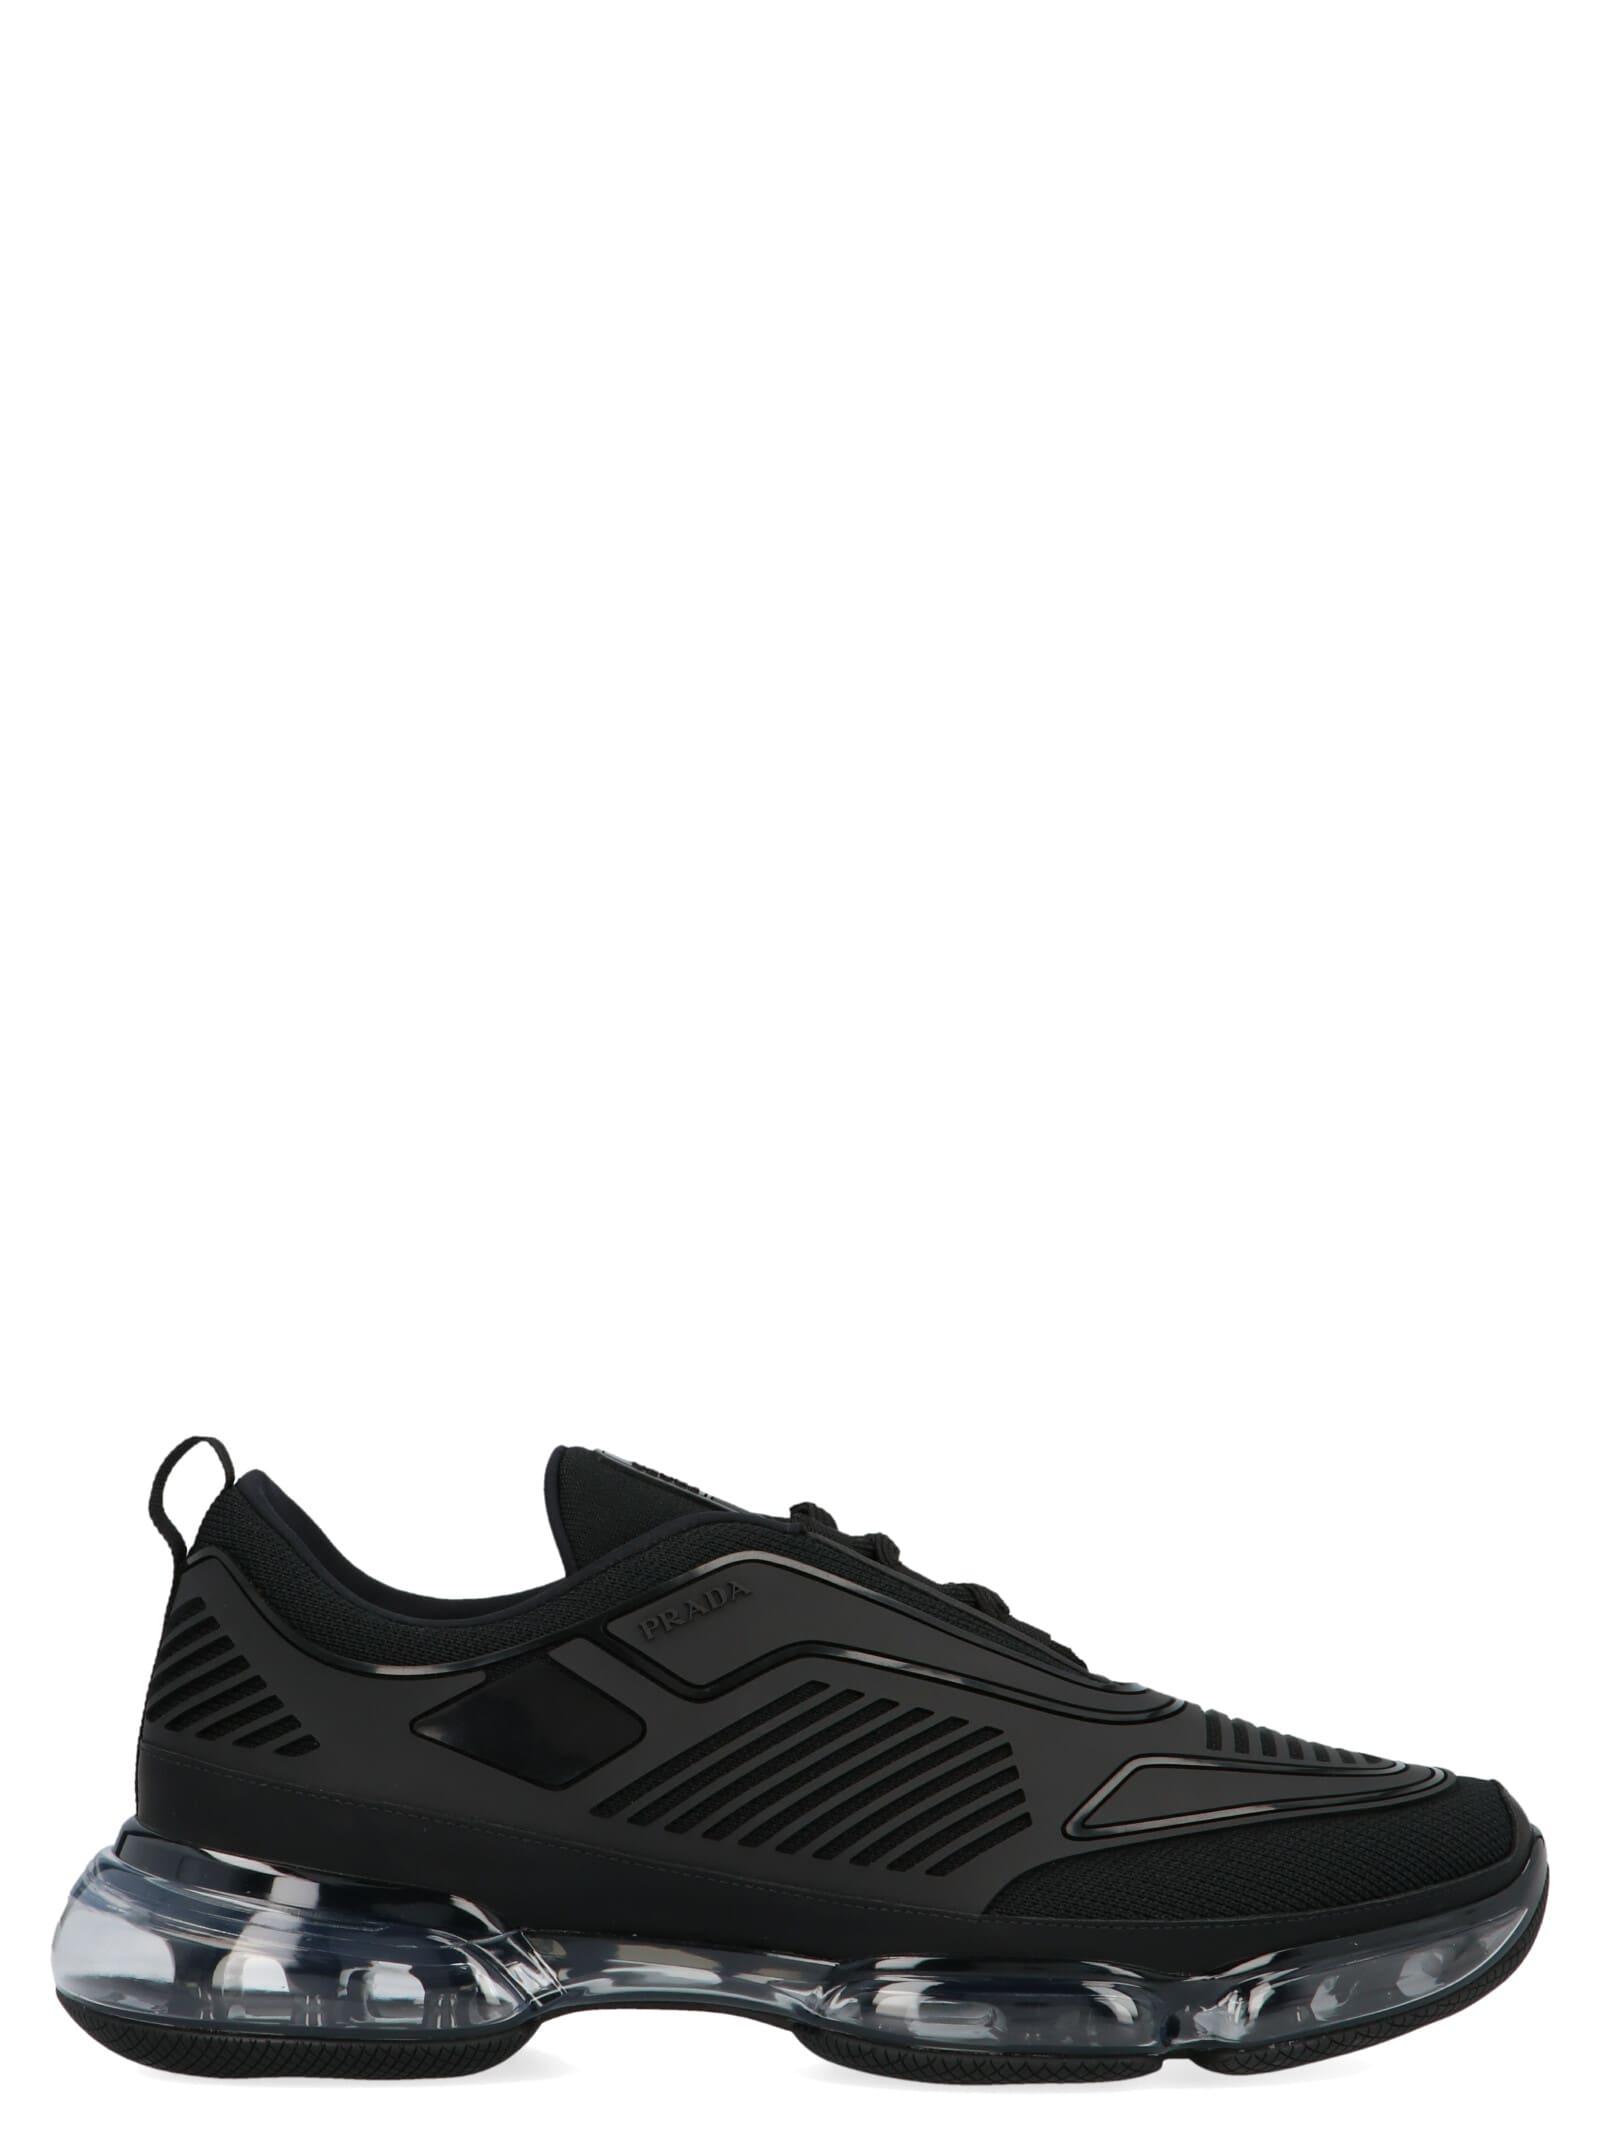 Prada new Cloudbust Shoes